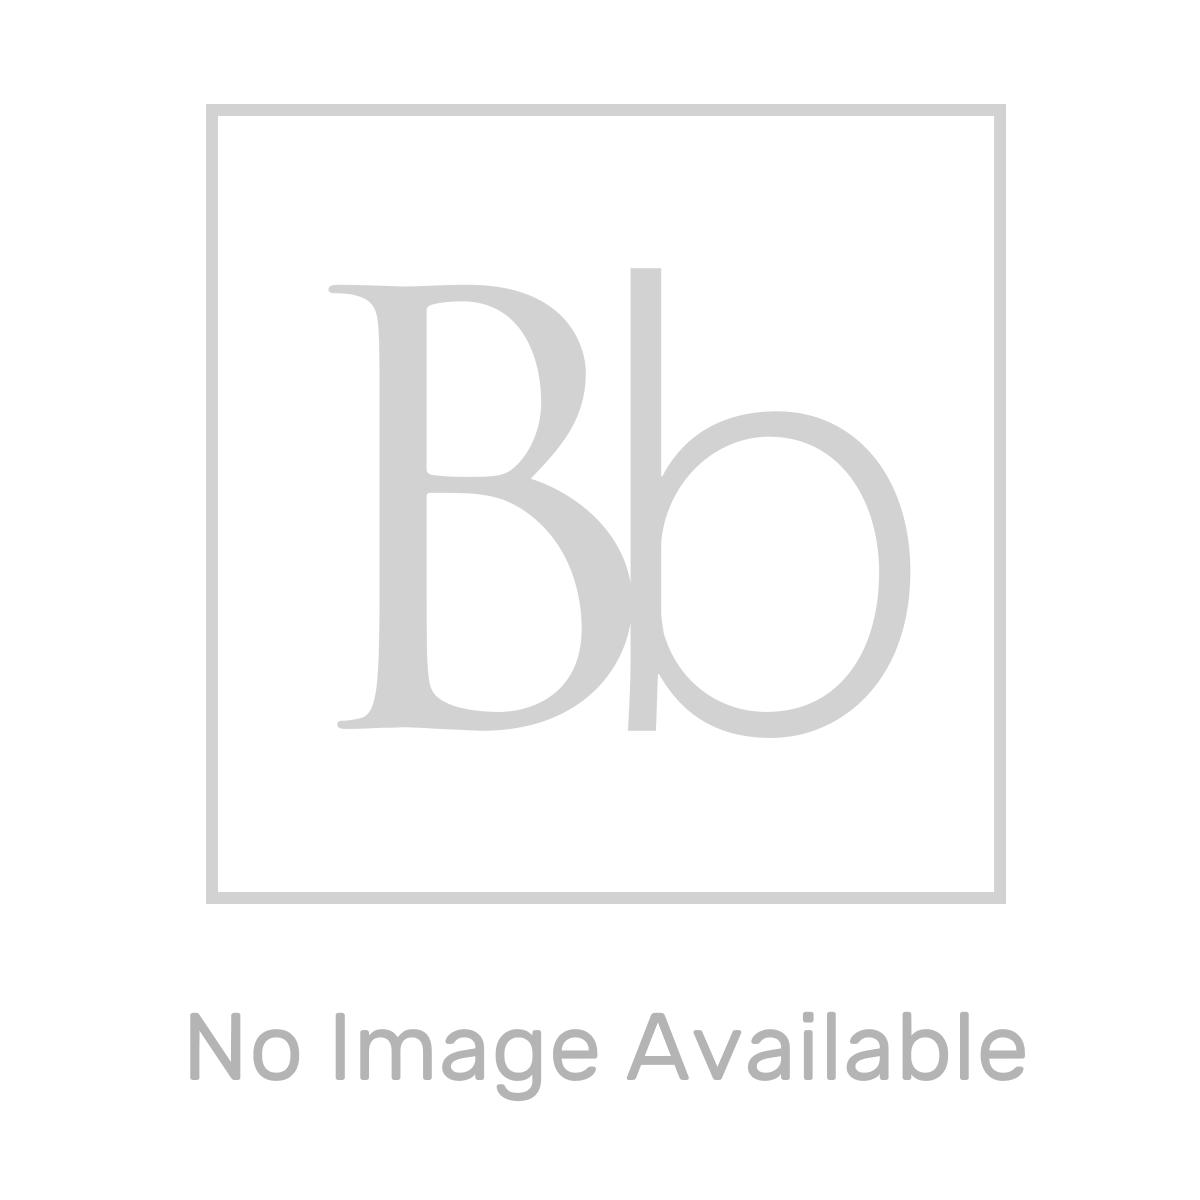 RAK Series 600 Left Handed L Shaped Shower Bath Suite Drawing